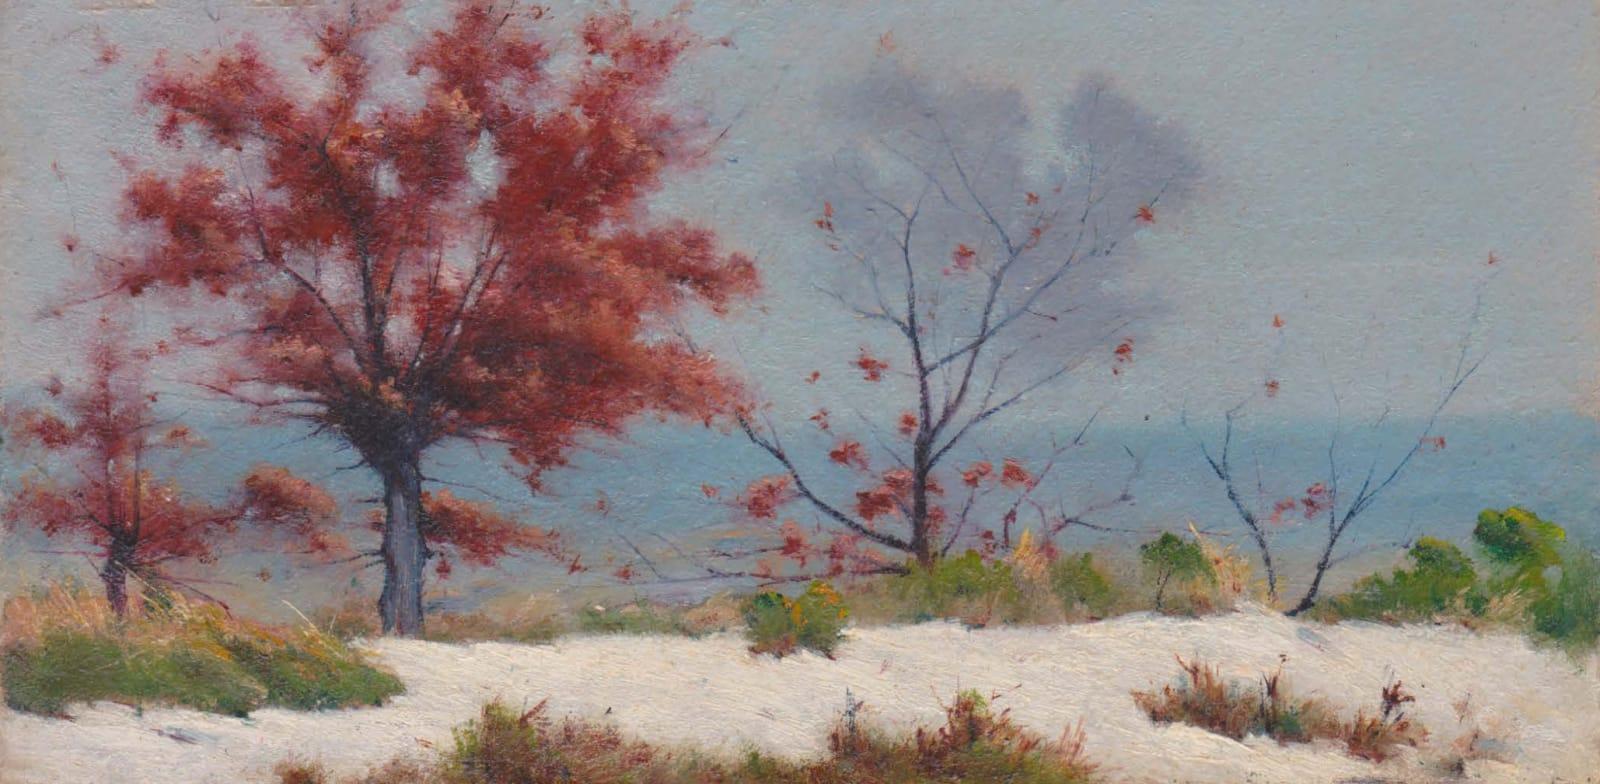 EDOUARD ATHÉNOSY, Winter, 1921